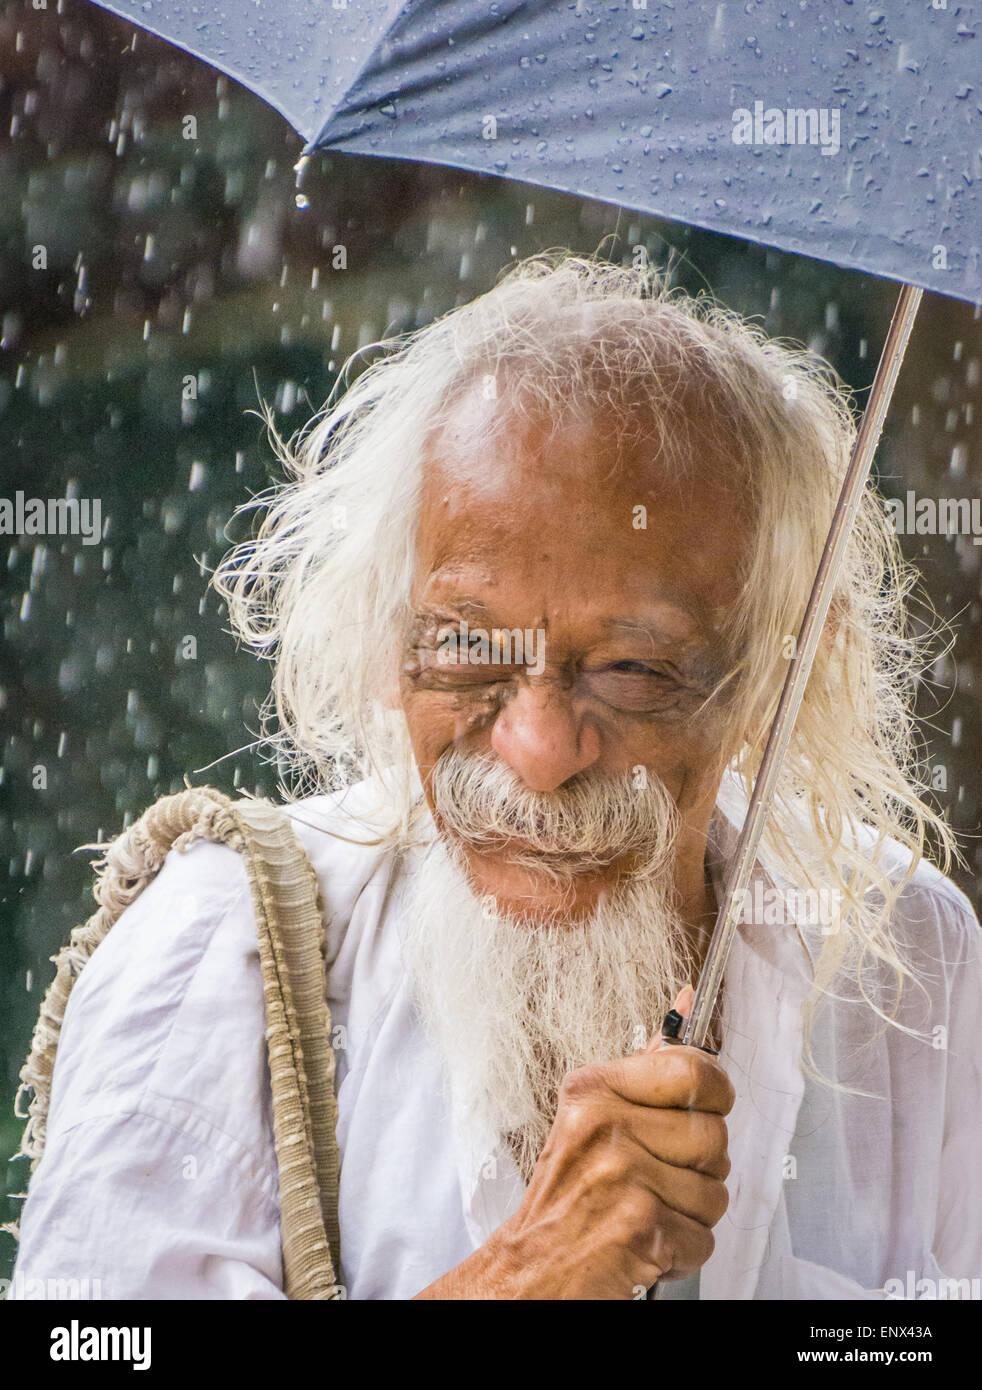 Sadhu holding an umbrella in the rain at the Sri Ramana Ashram in Tiruvannamalai, India - Stock Image